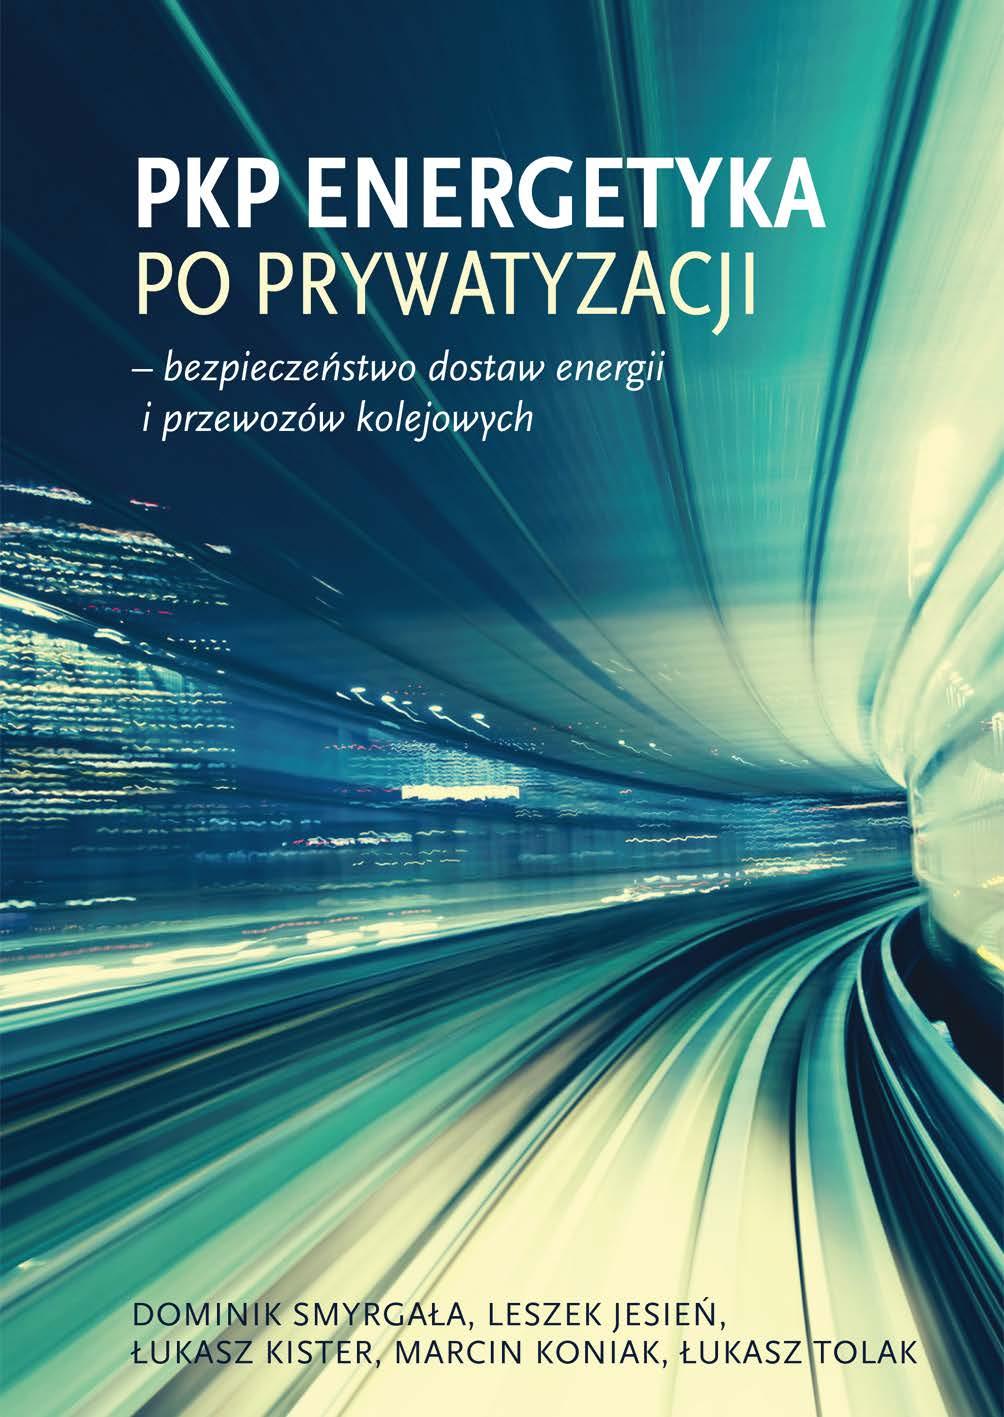 pkp energetyka_przod